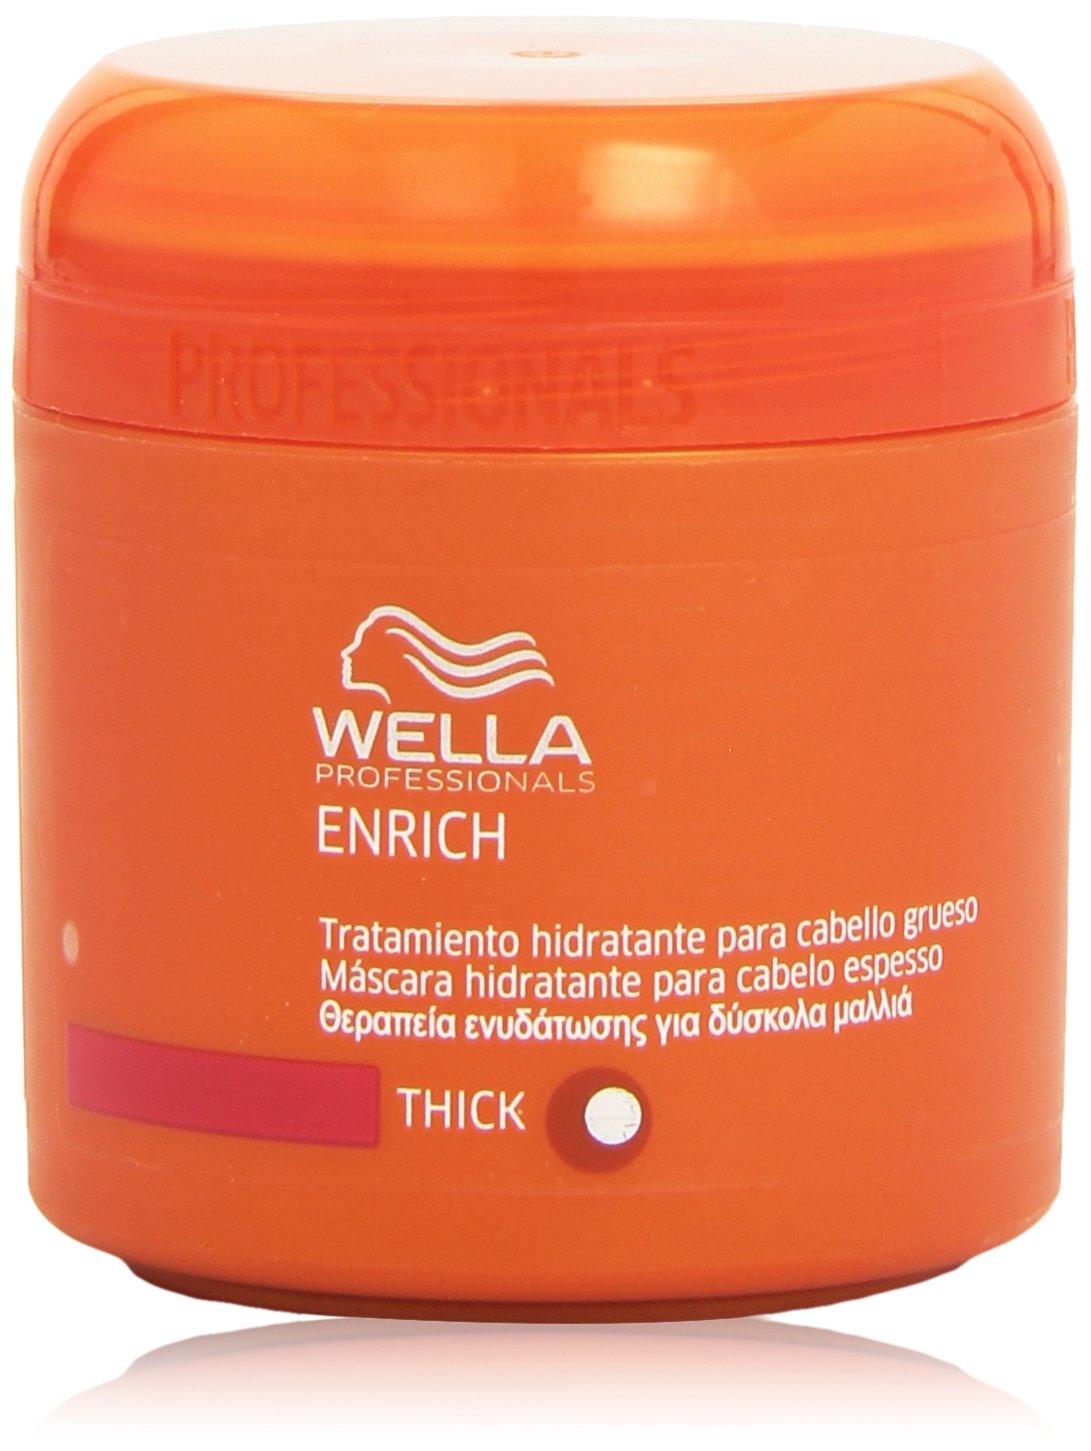 Wella Enrich Mask Thick Hair Mascarilla - 150 ml